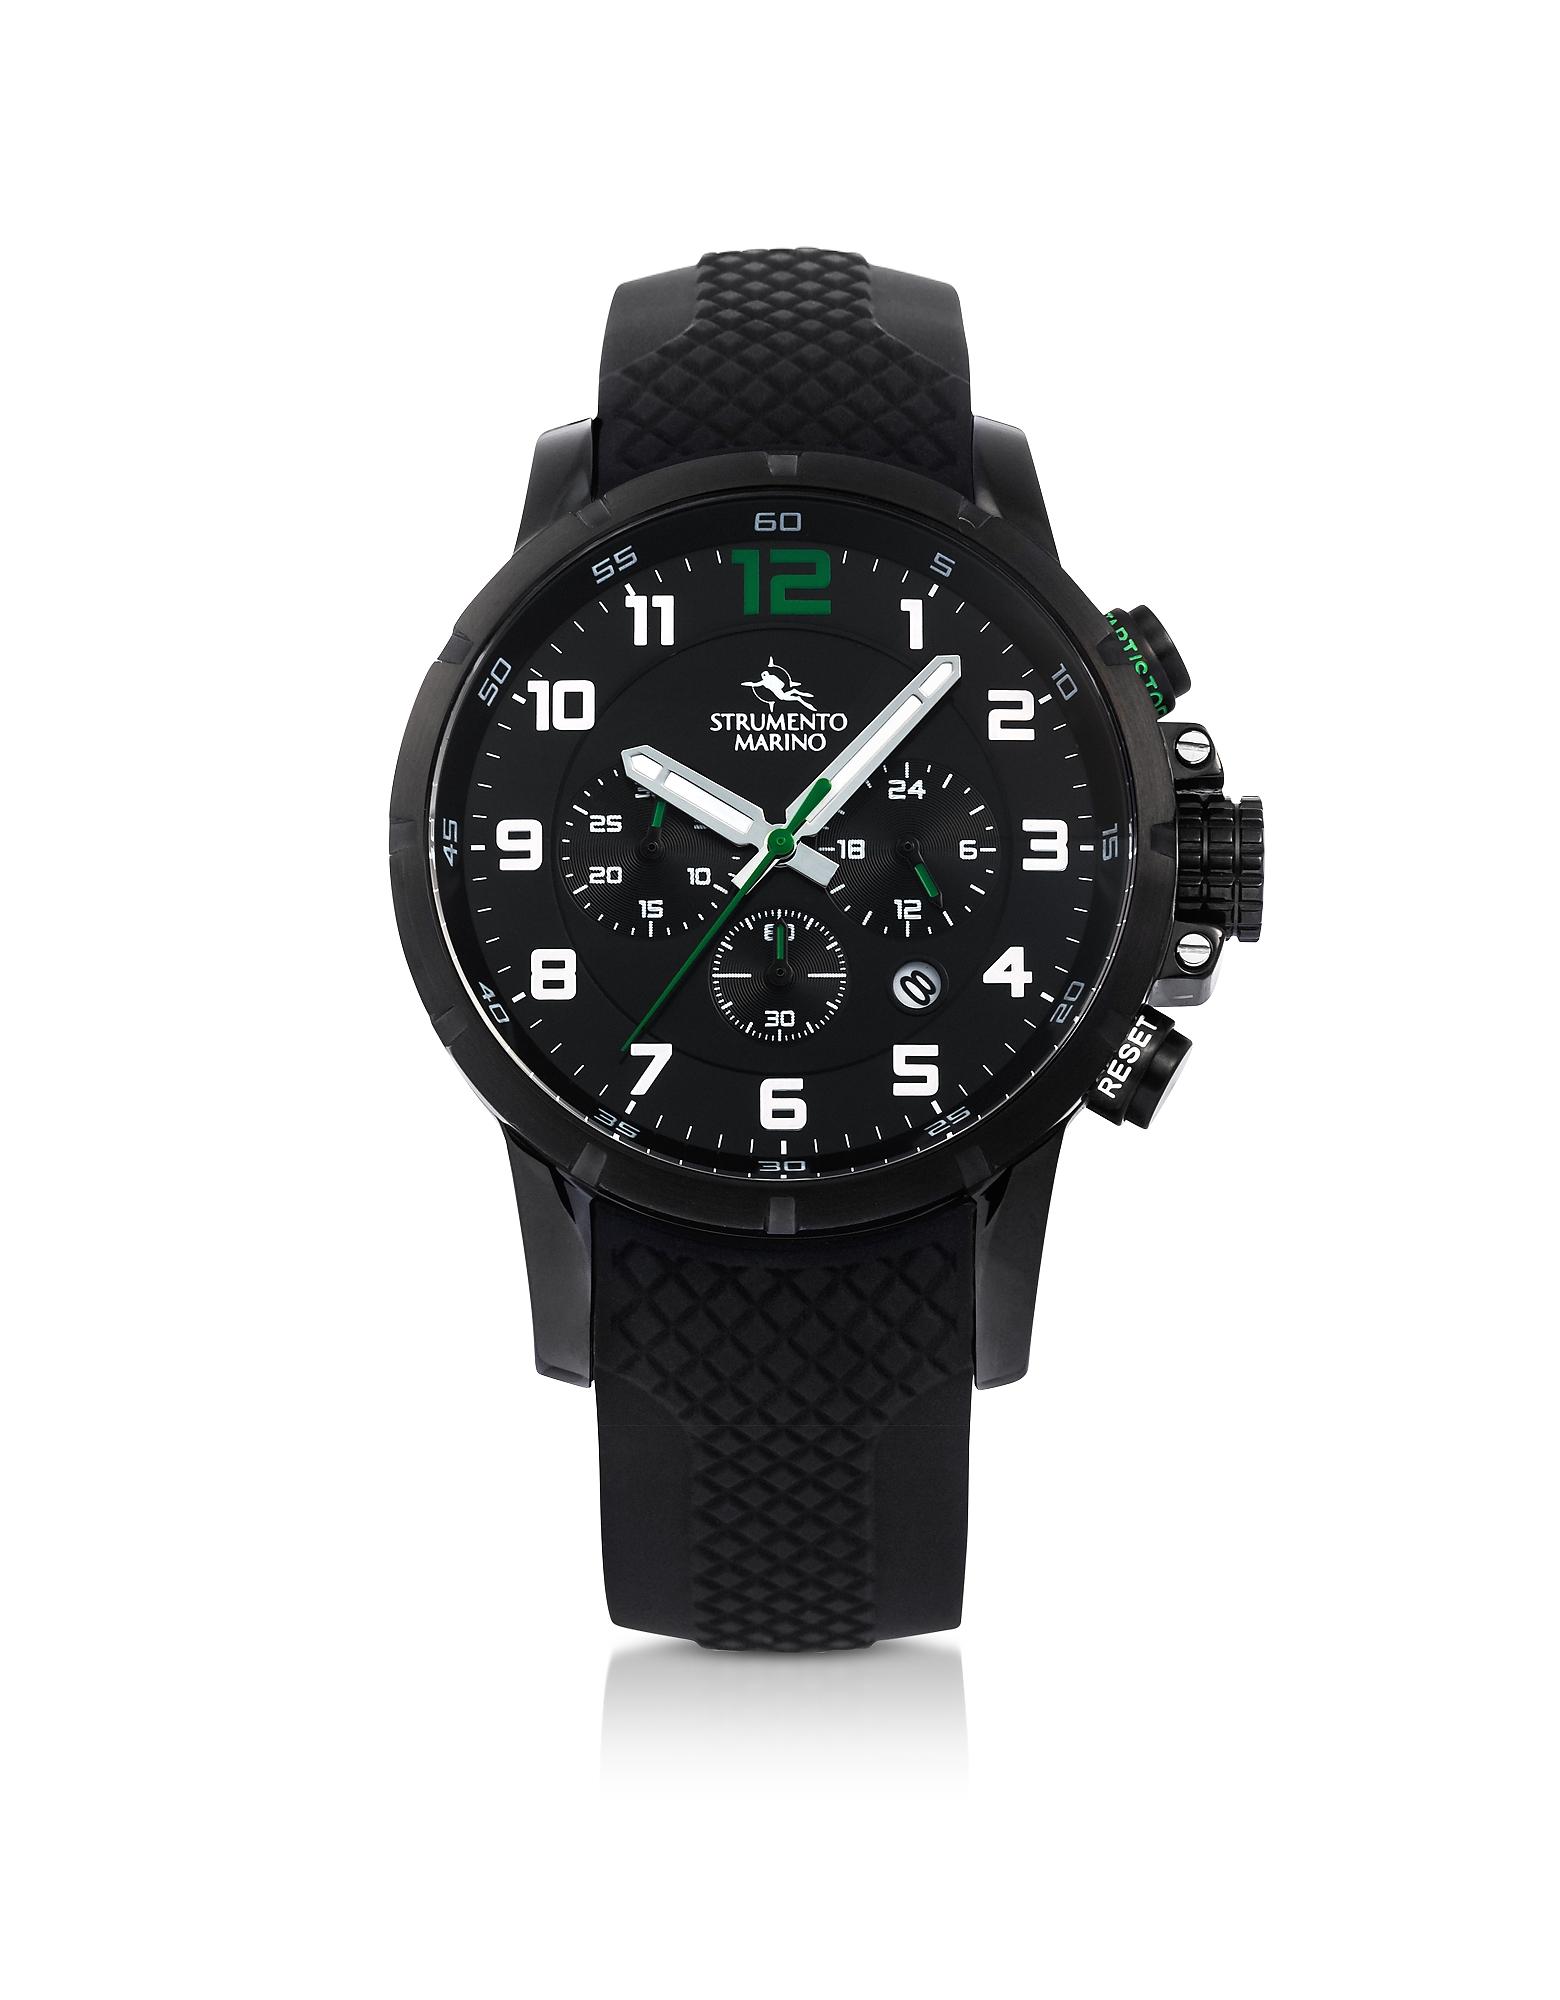 Strumento Marino Men's Watches, Summertime Black Stainless Steel Men's Chronograph Watch